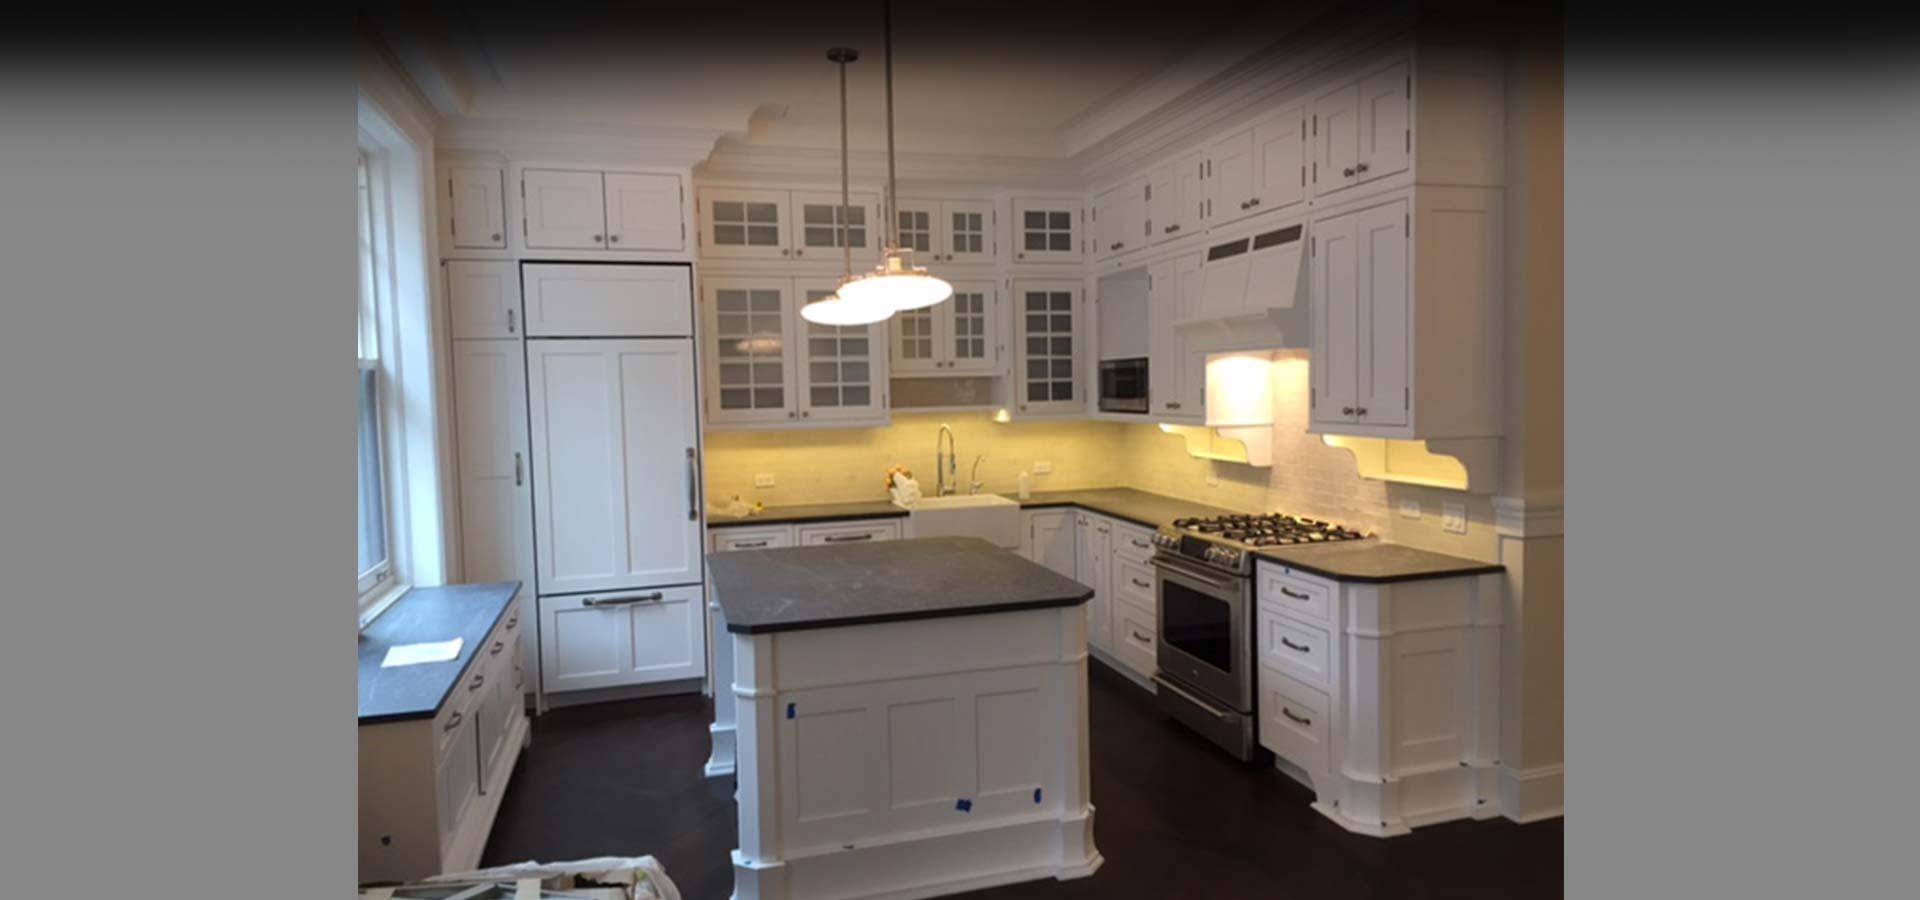 Modern traditional kitchen design kohn architecture for New traditional kitchen designs